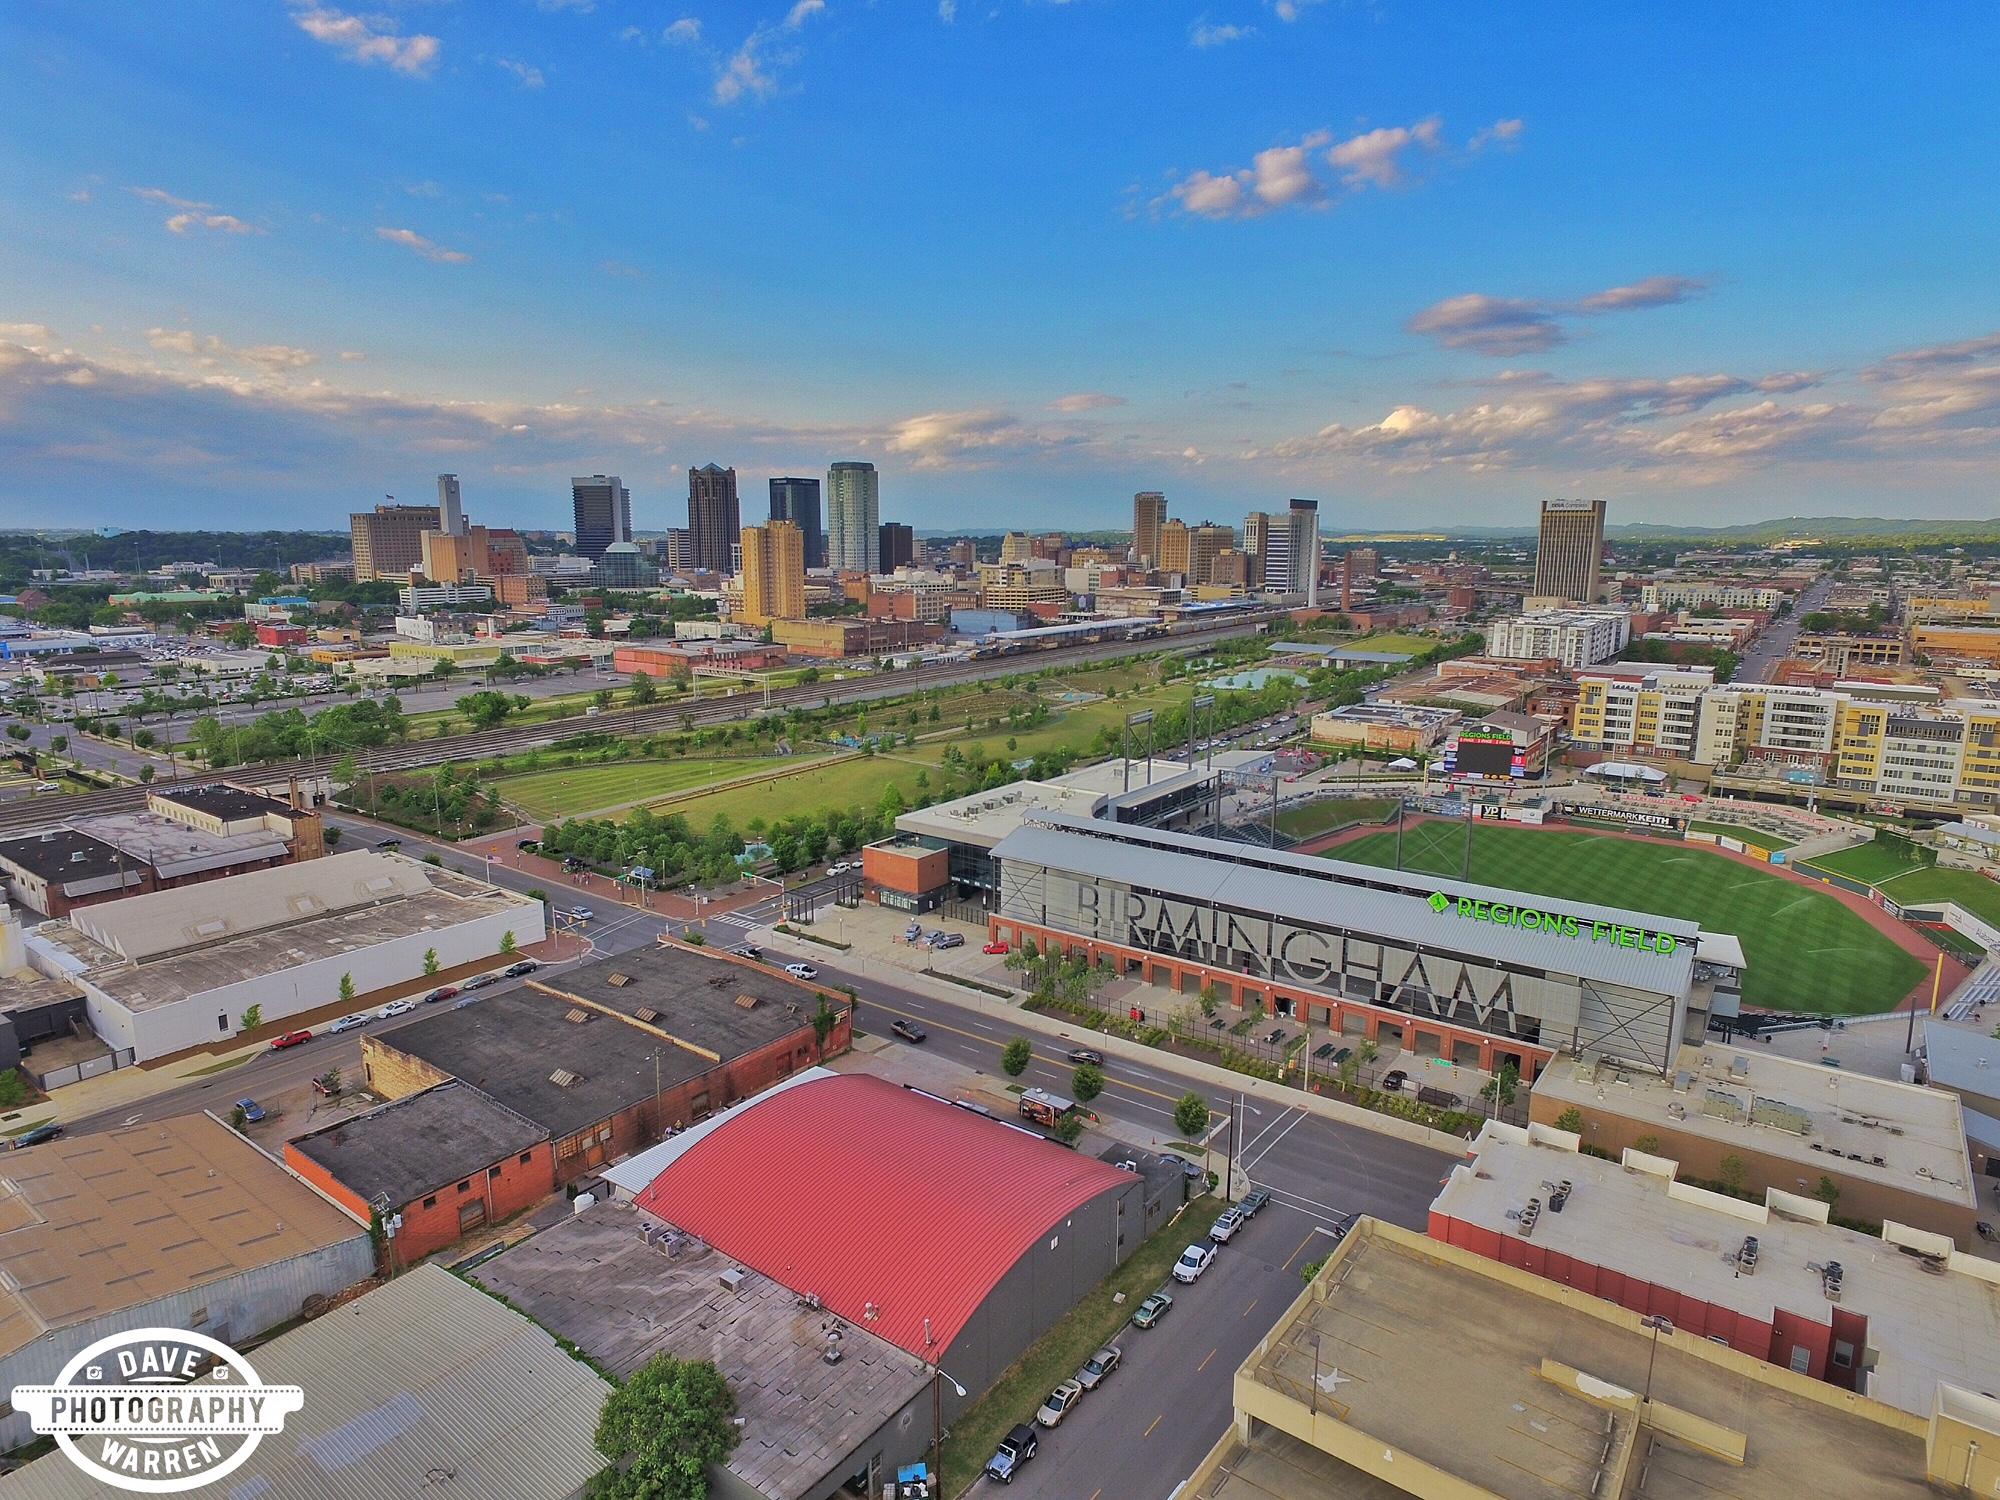 Birmingham, Alabama Aerial Photography